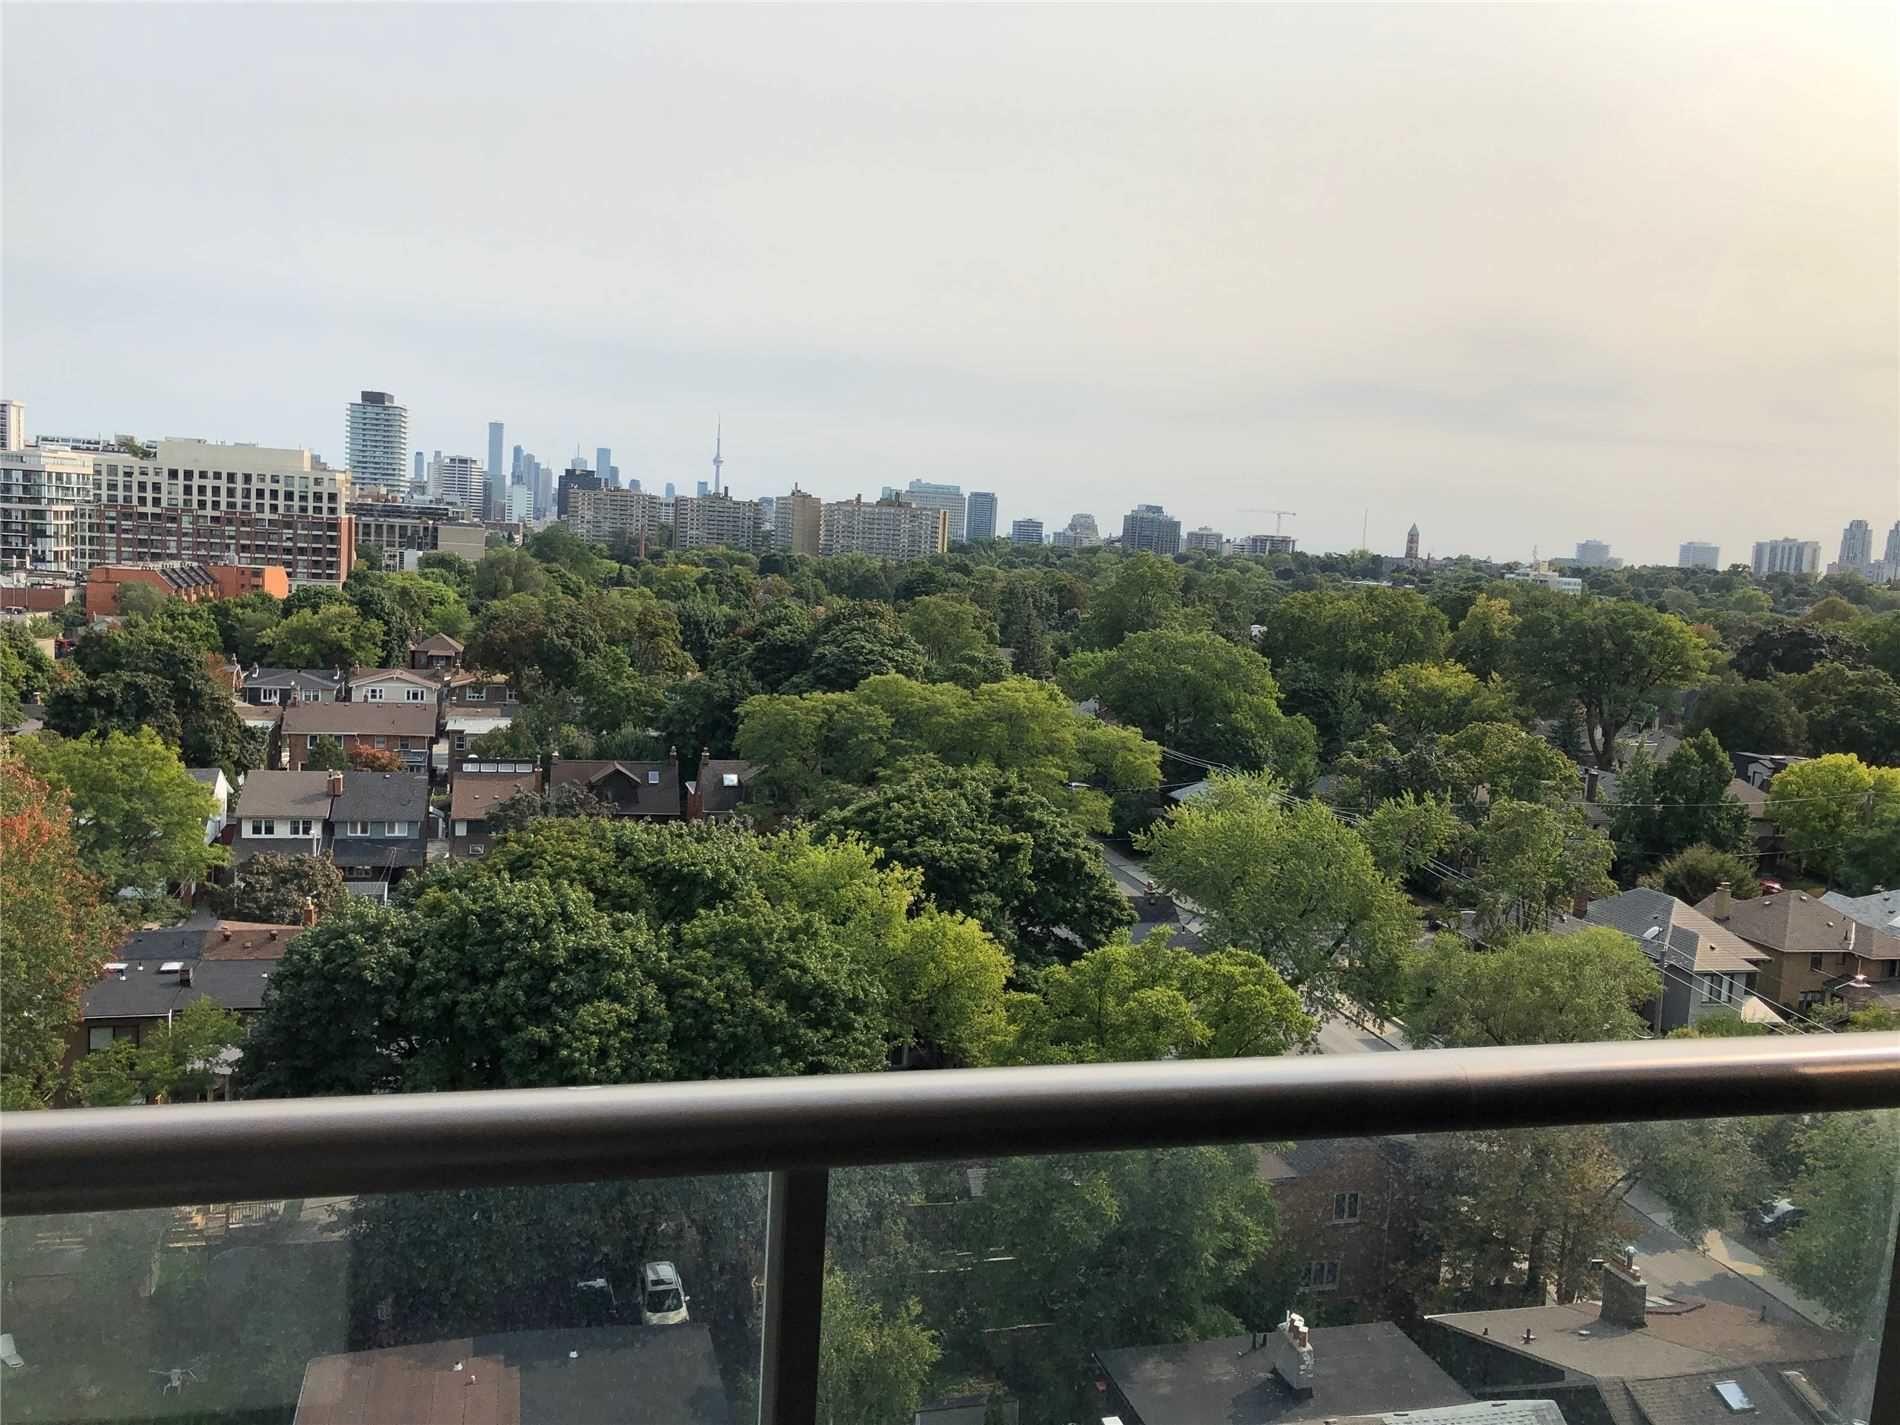 Photo 13: Photos: 1103 60 Berwick Avenue in Toronto: Yonge-Eglinton Condo for lease (Toronto C03)  : MLS®# C4822743